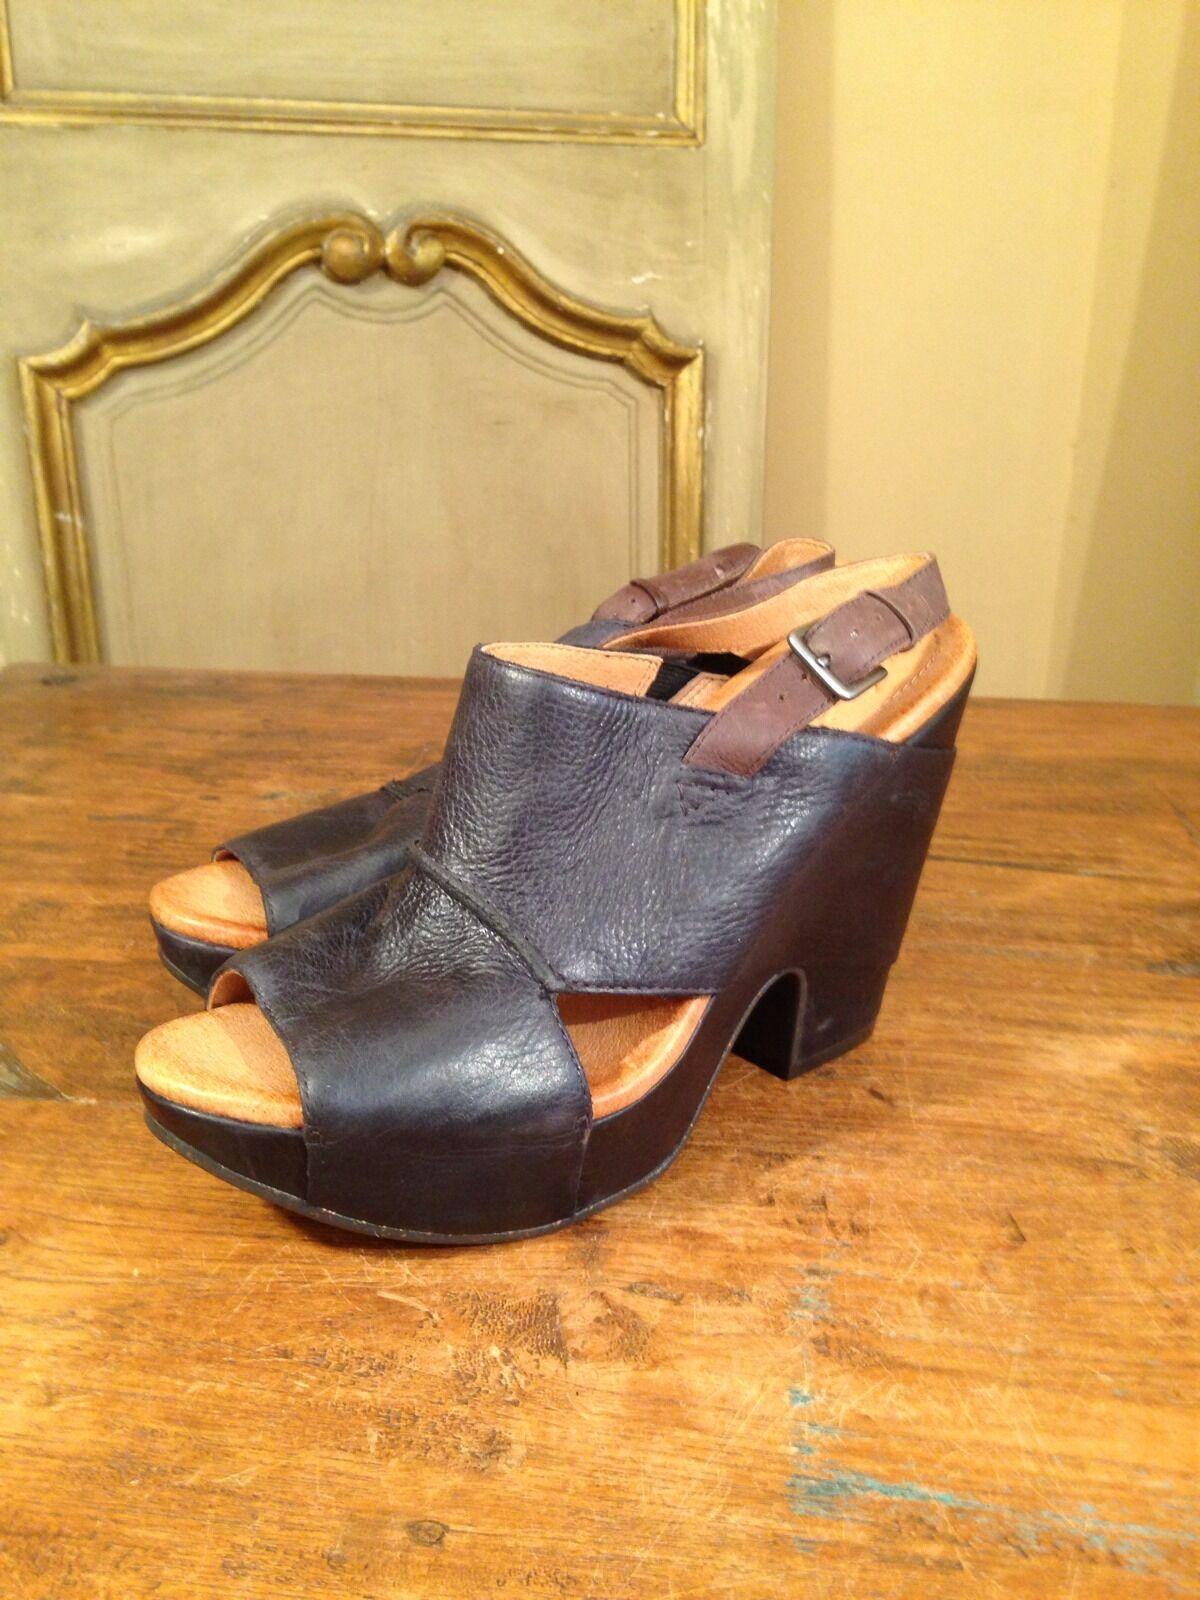 Christy Stewart Naya  Monroe  Sling Back Platform damen Sandals schuhe Größe 8